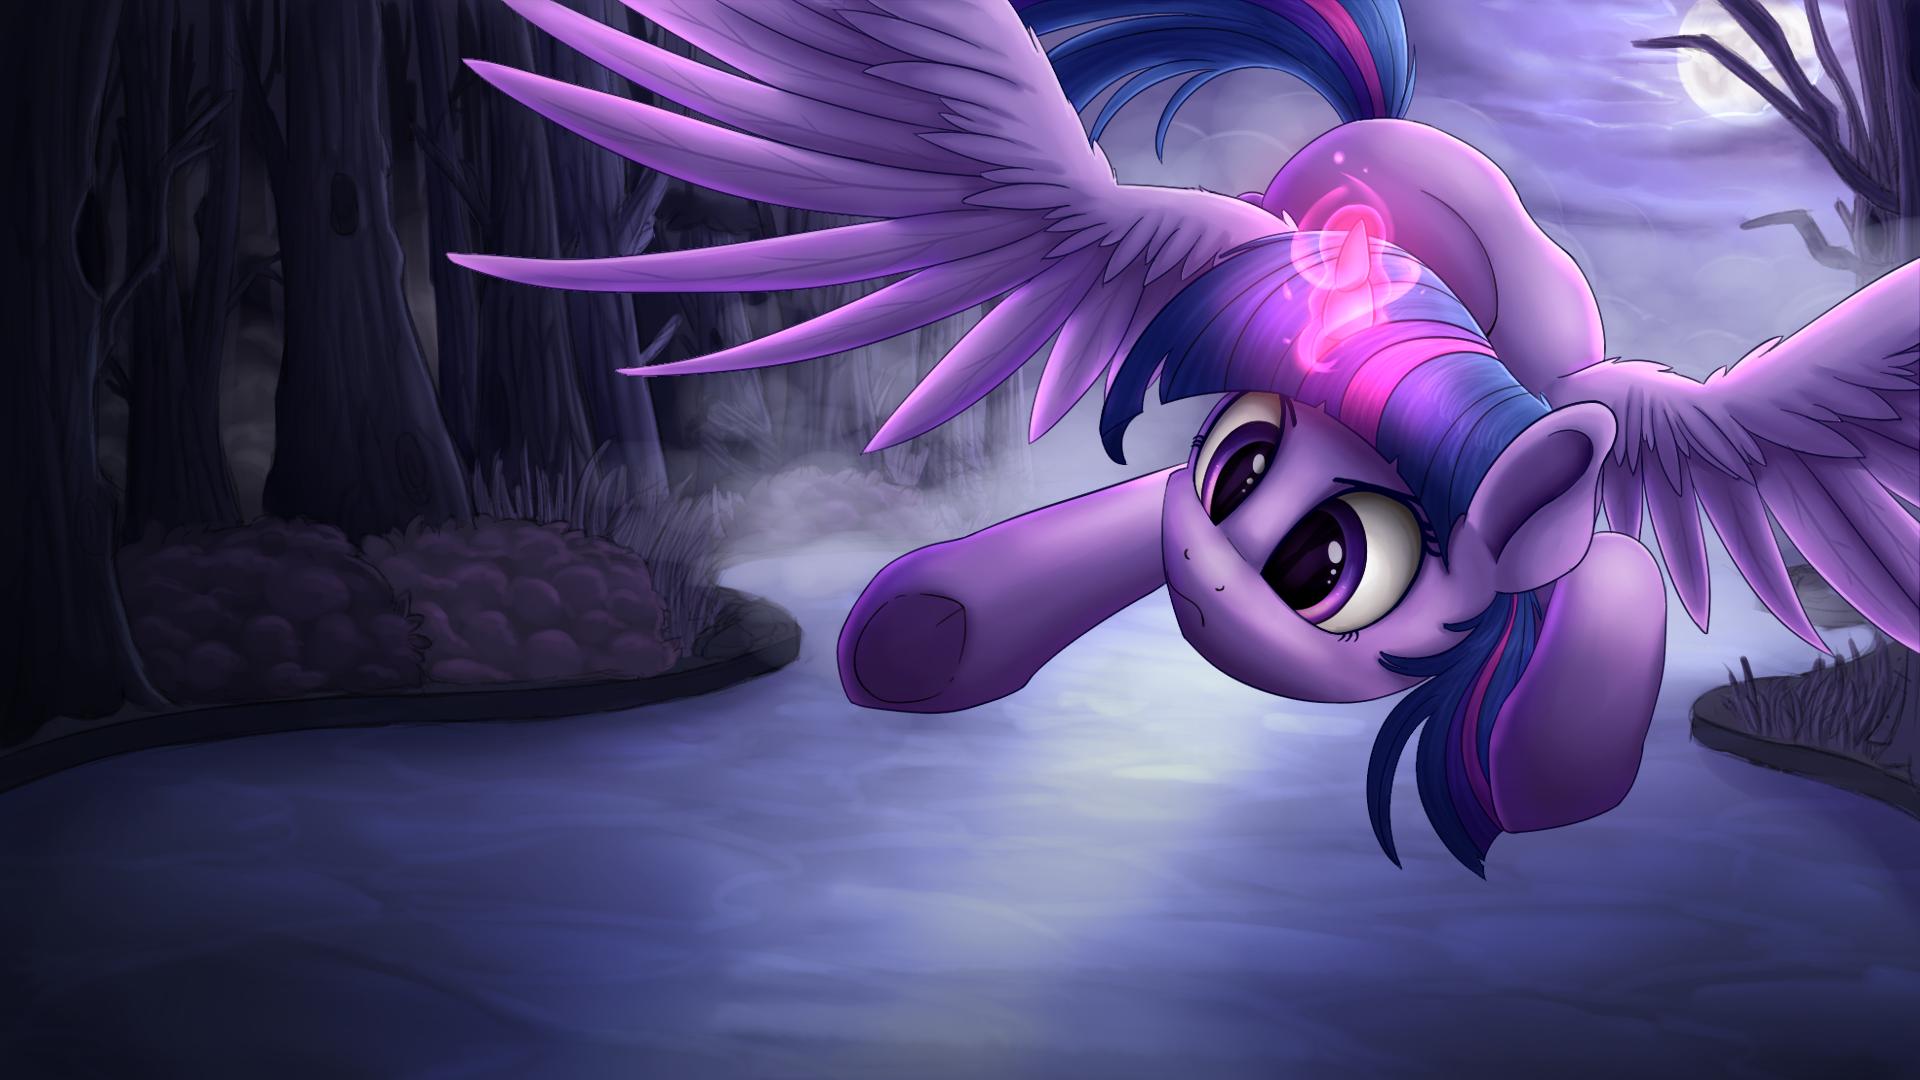 Twilight Sparkle Splash Art by VanillaGhosties